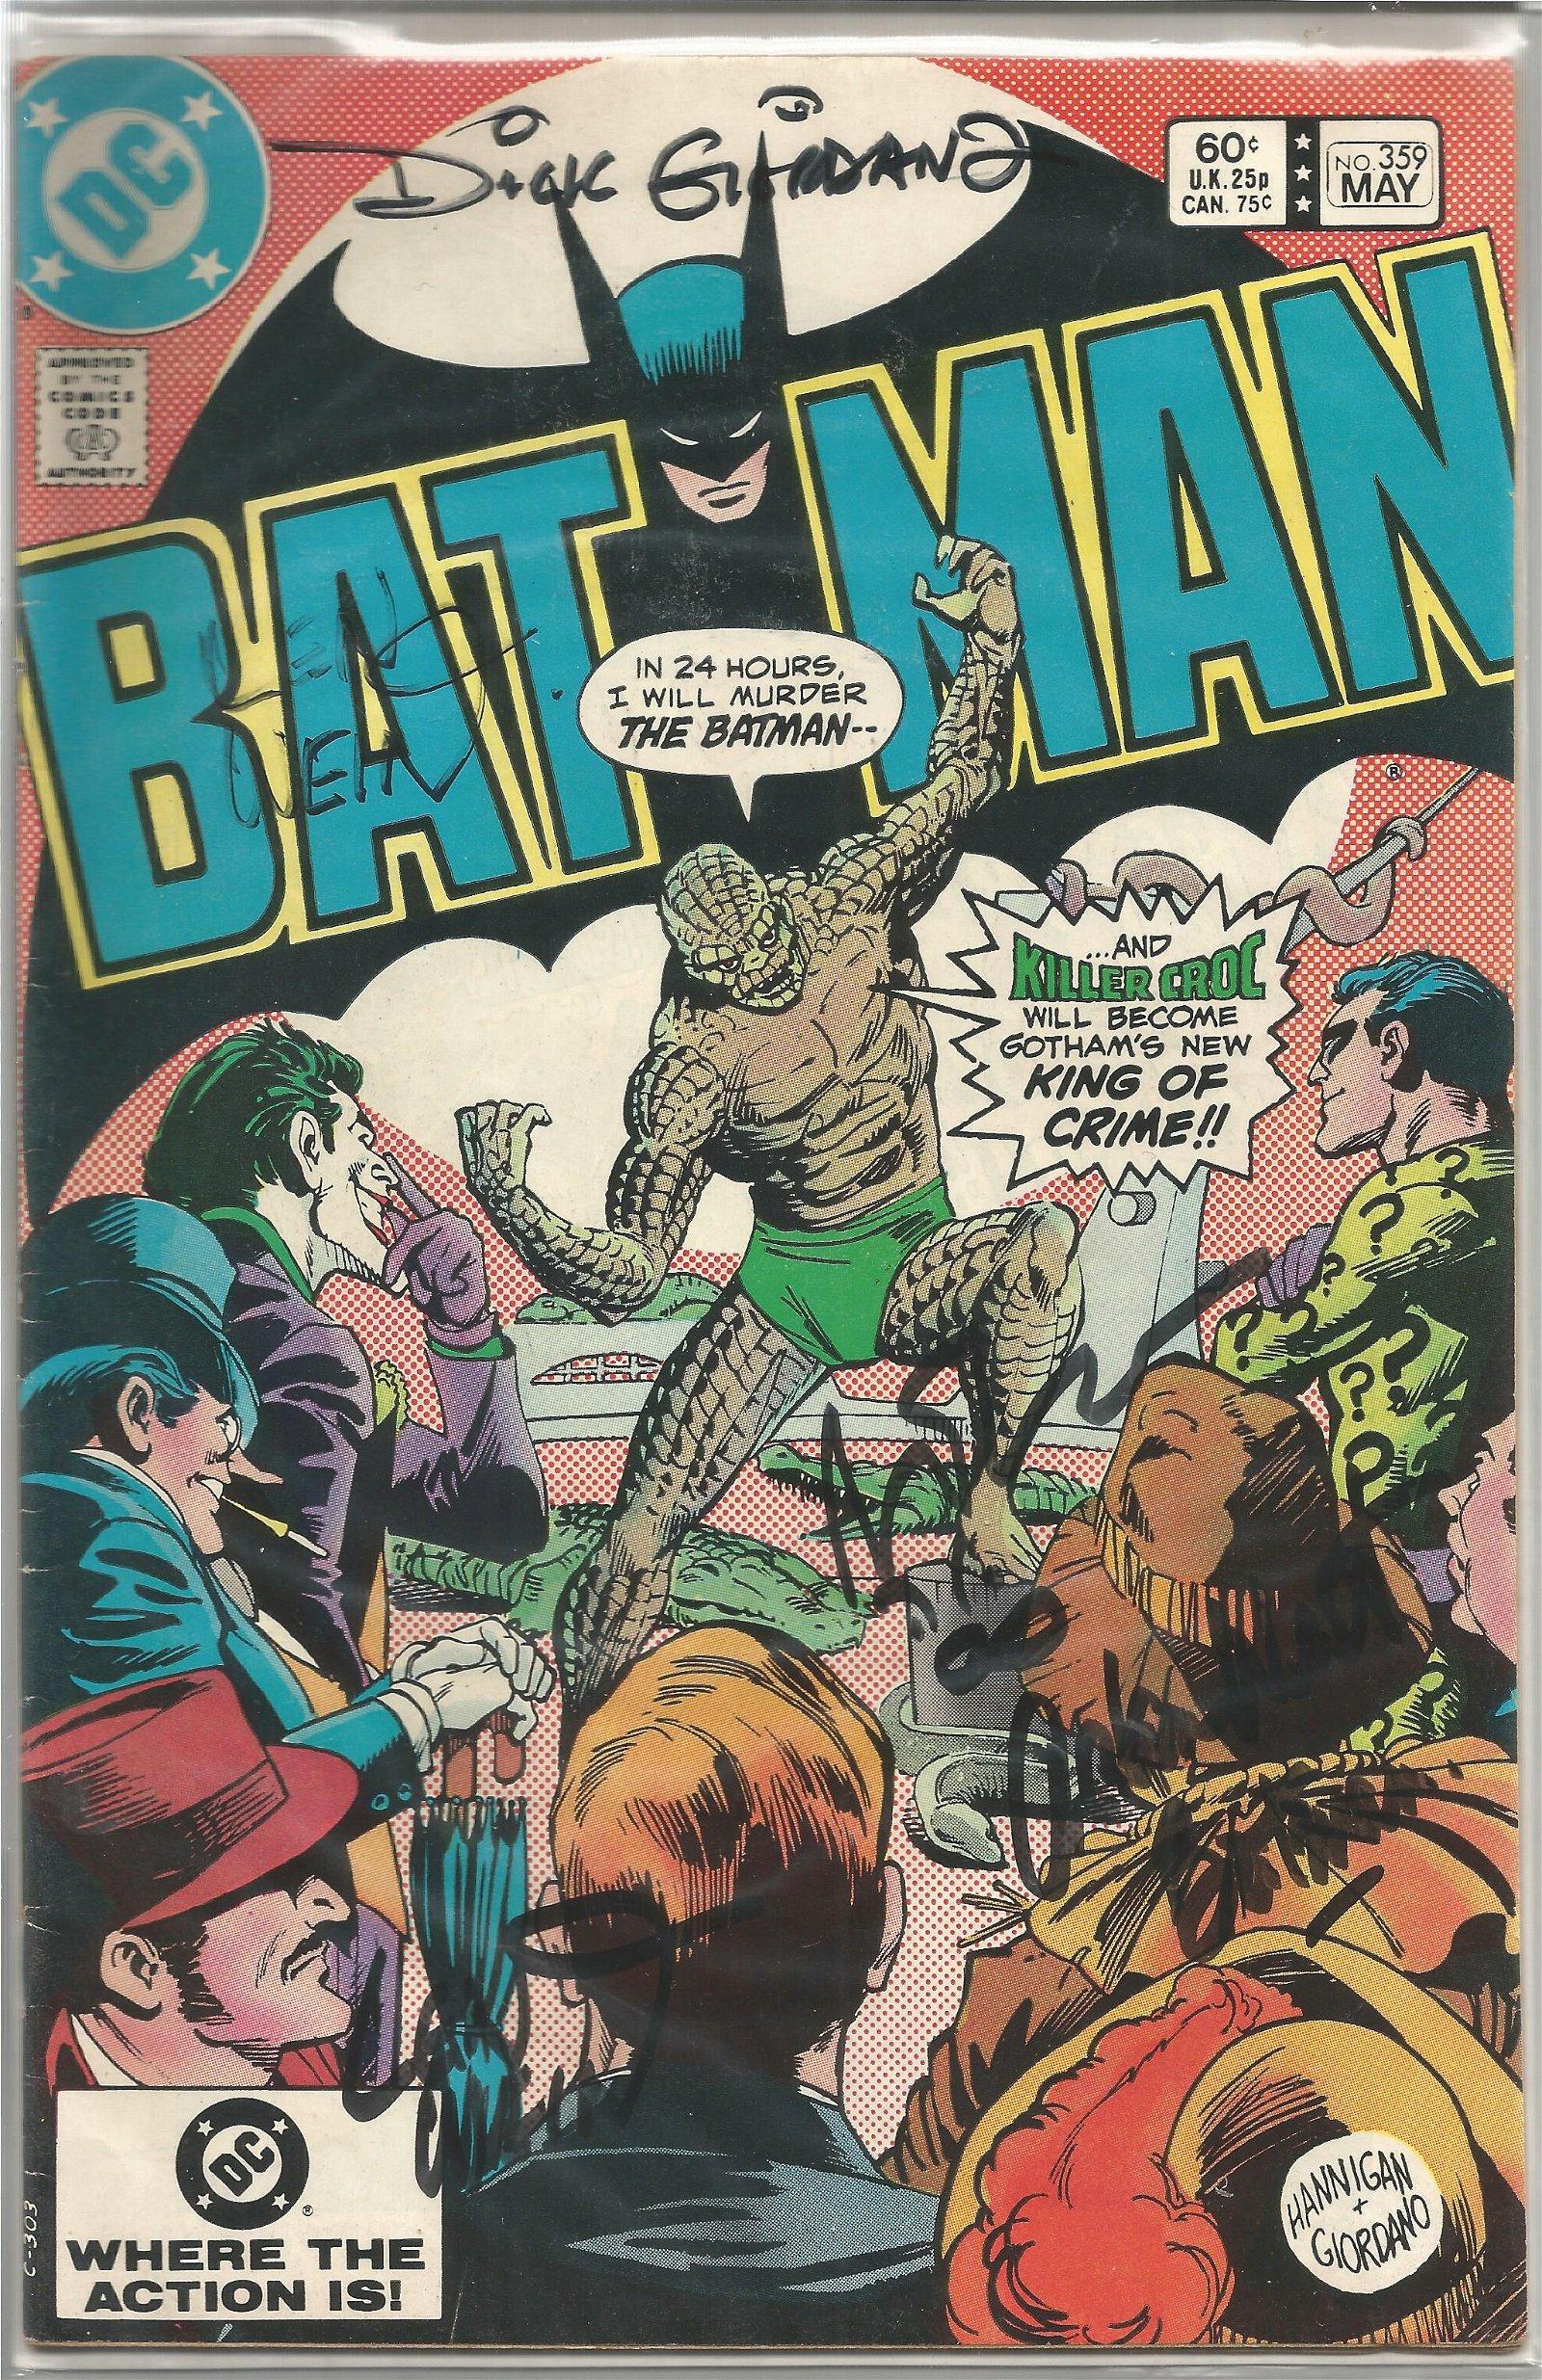 Adam West, Dick Giordano and Len Wein signed Batman